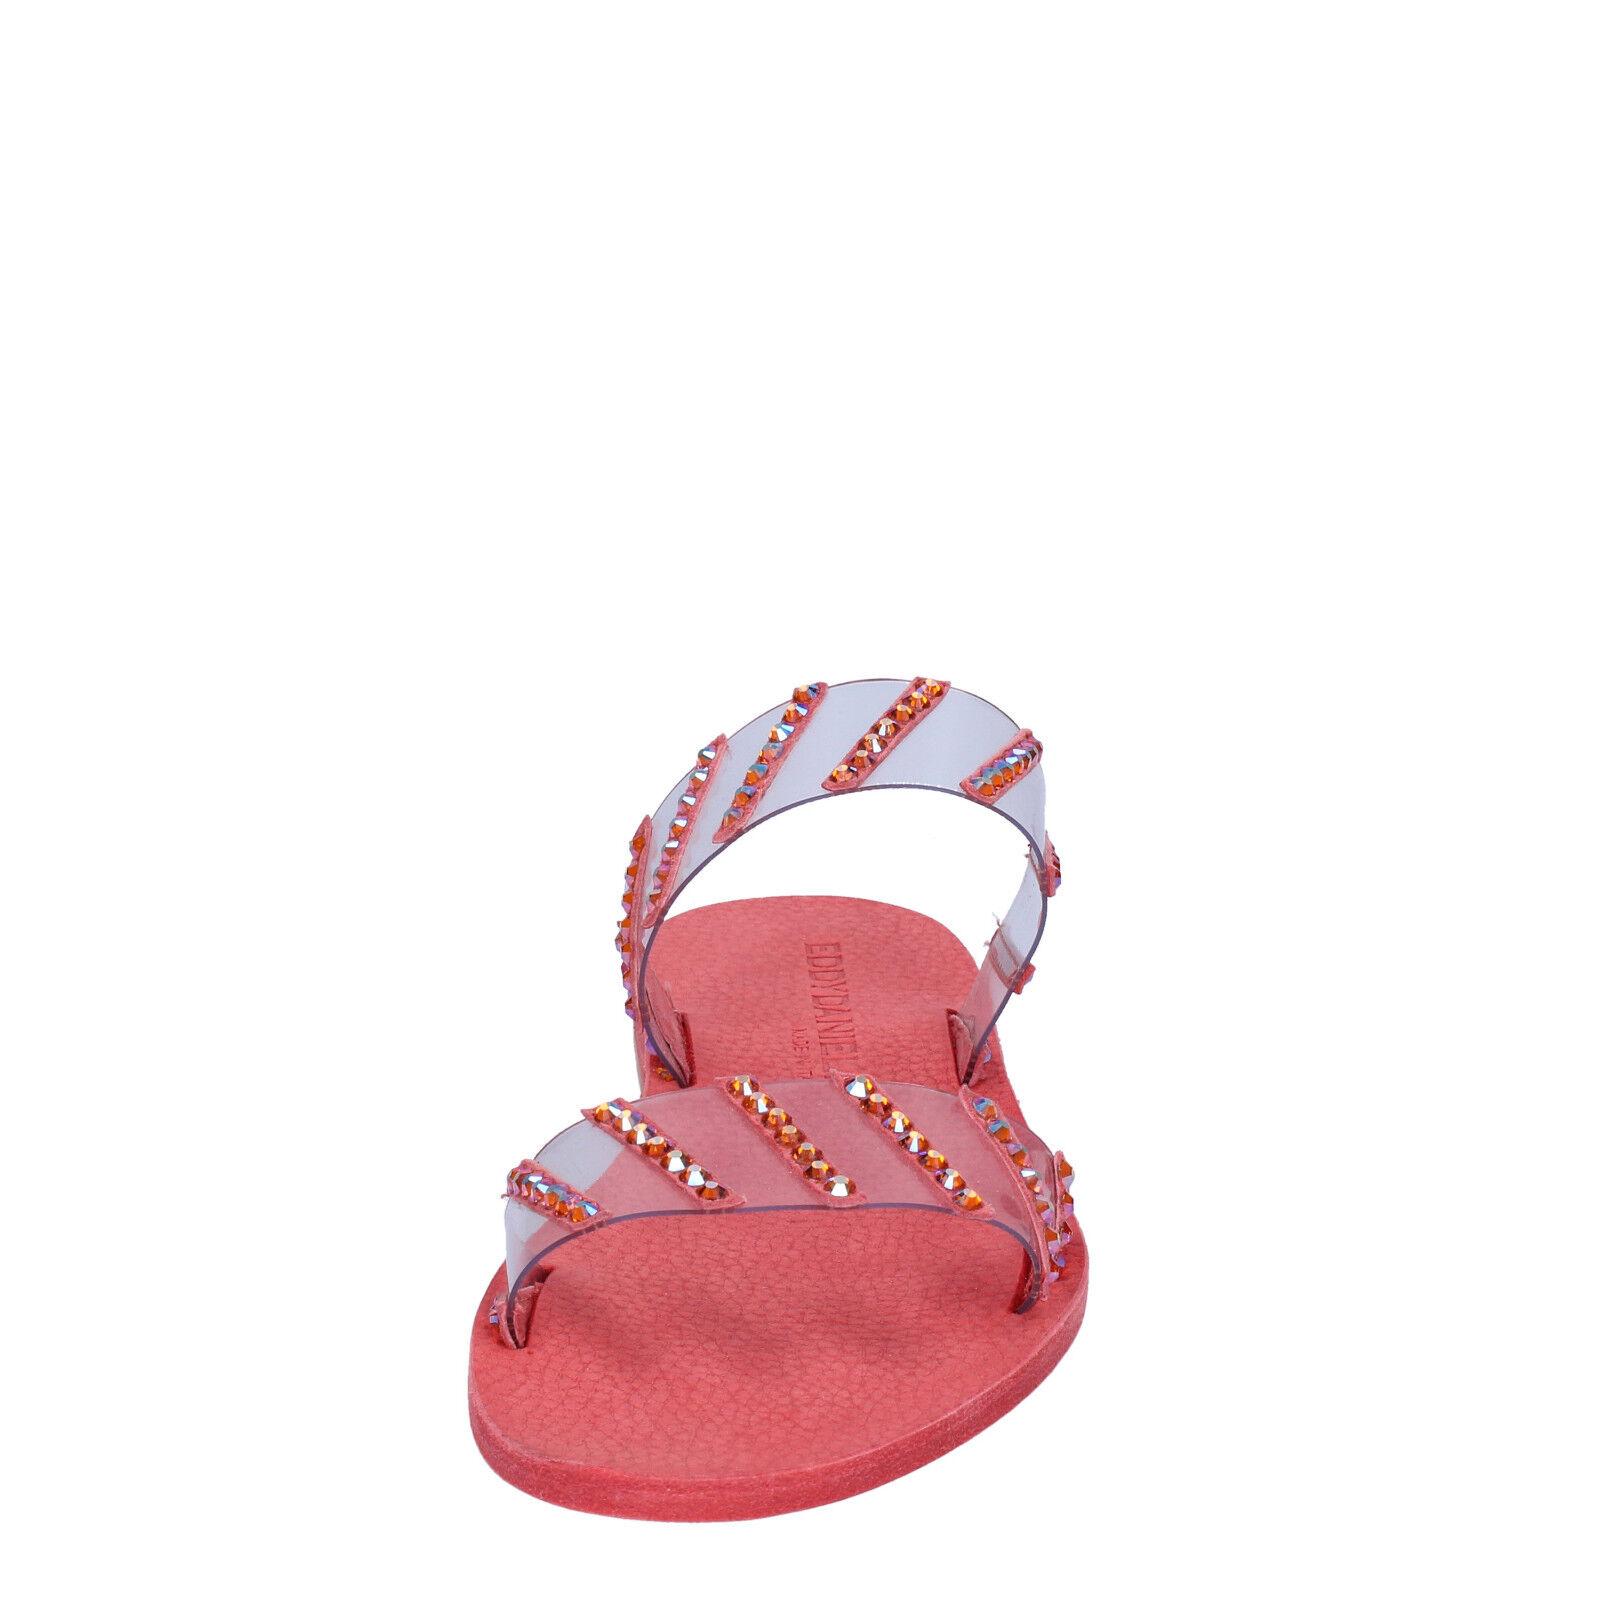 Damen schuhe sandalen EDDY DANIELE 37 EU sandalen schuhe rot swarovski AW463 07ddb9